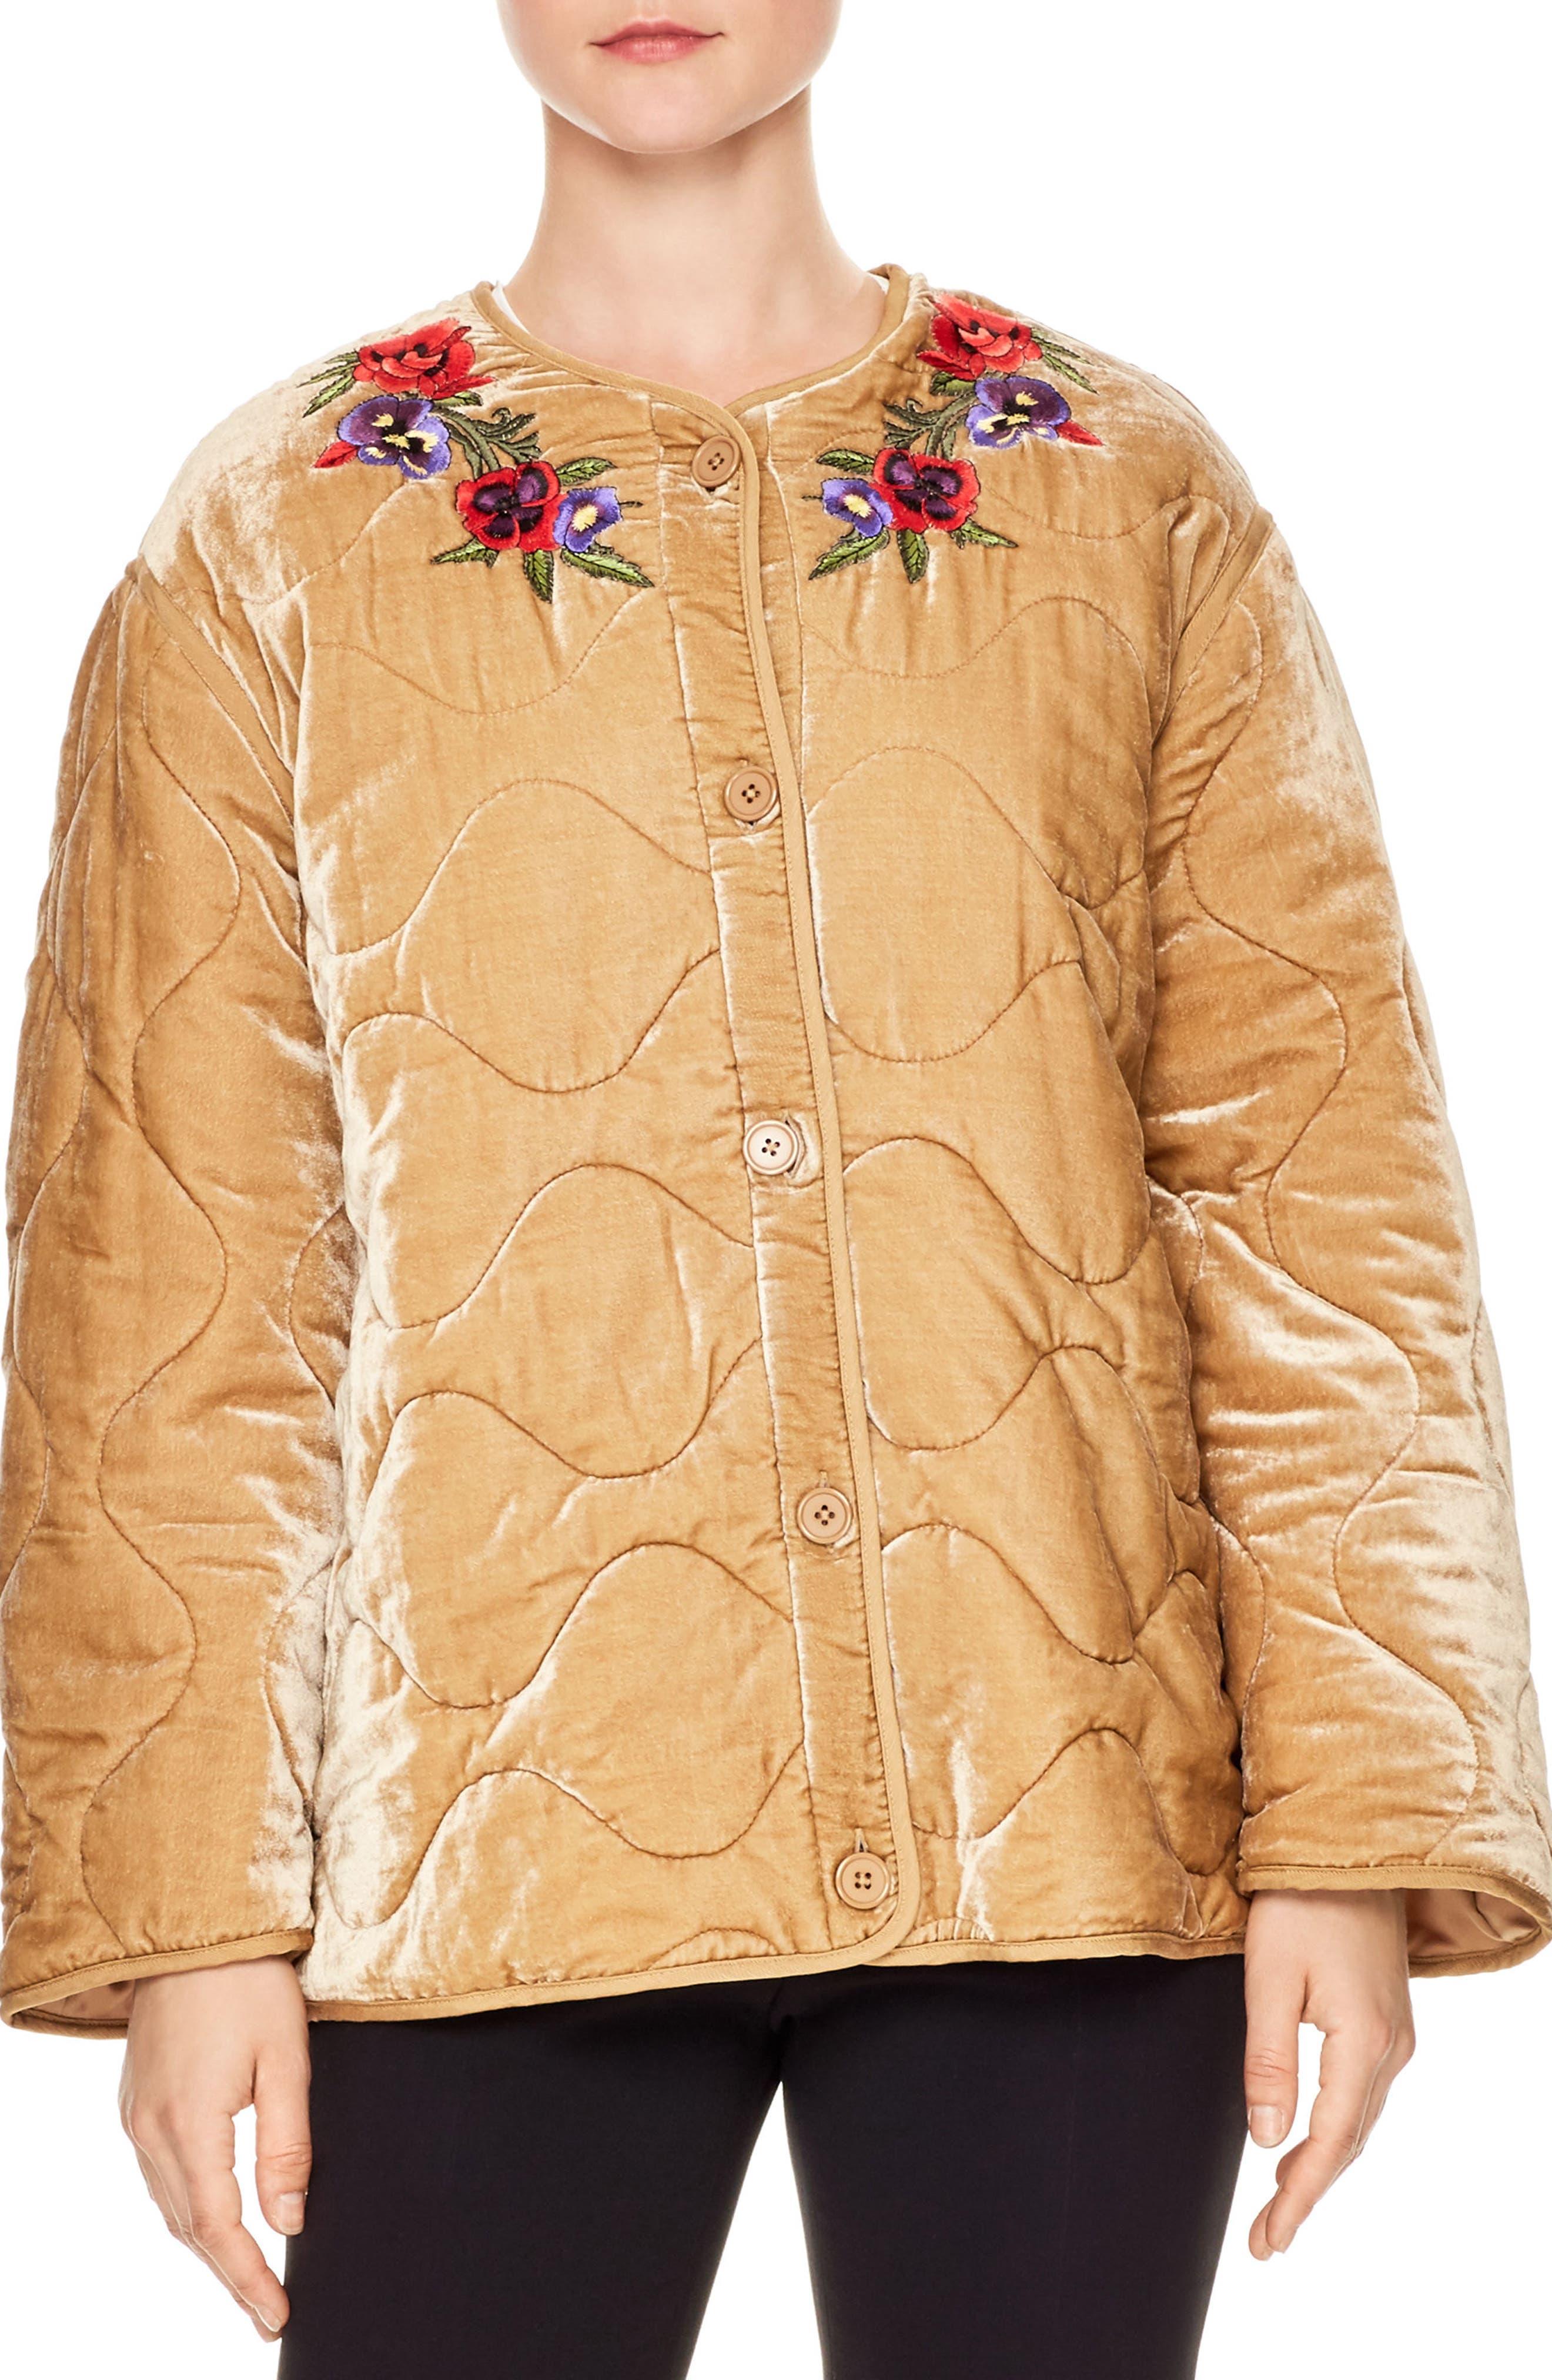 Reva Quilted Velvet Jacket,                         Main,                         color, Beige